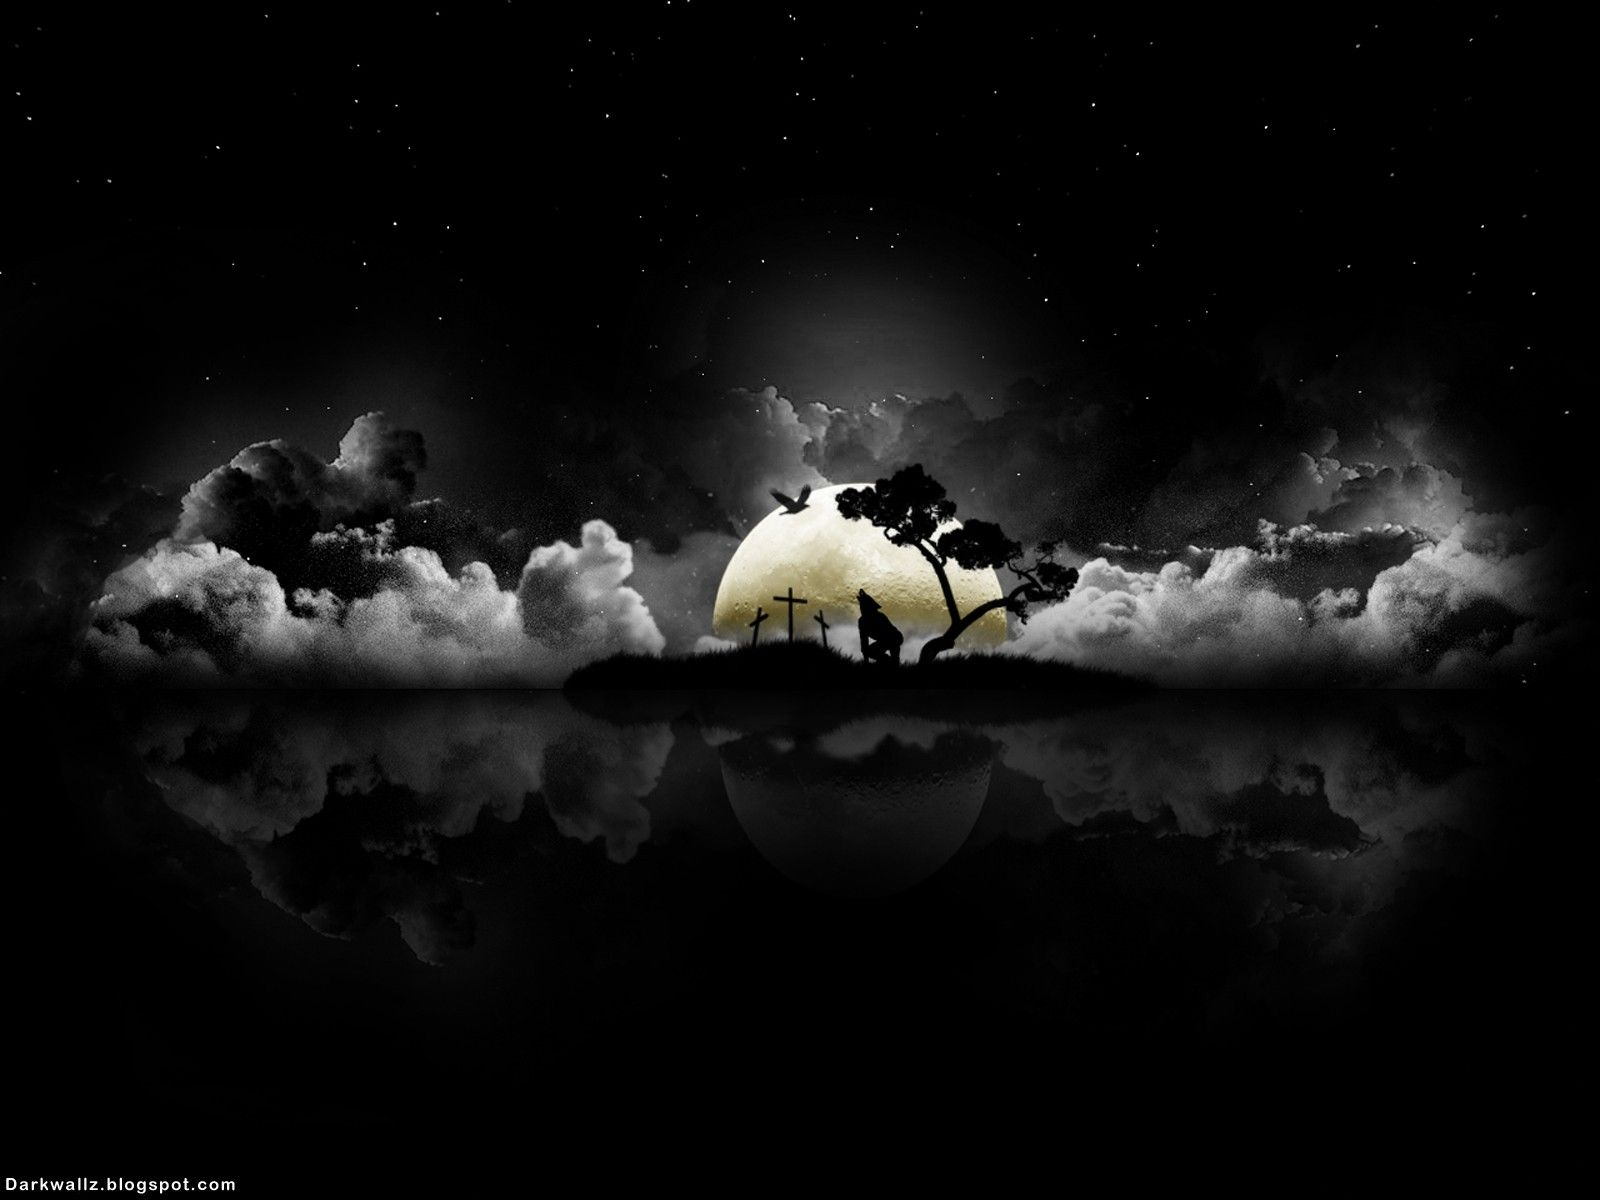 Fantastic Wallpaper Halloween High Resolution - 45c5d51954bdf55c98d8db09bddbaba2  Snapshot_749878.jpg